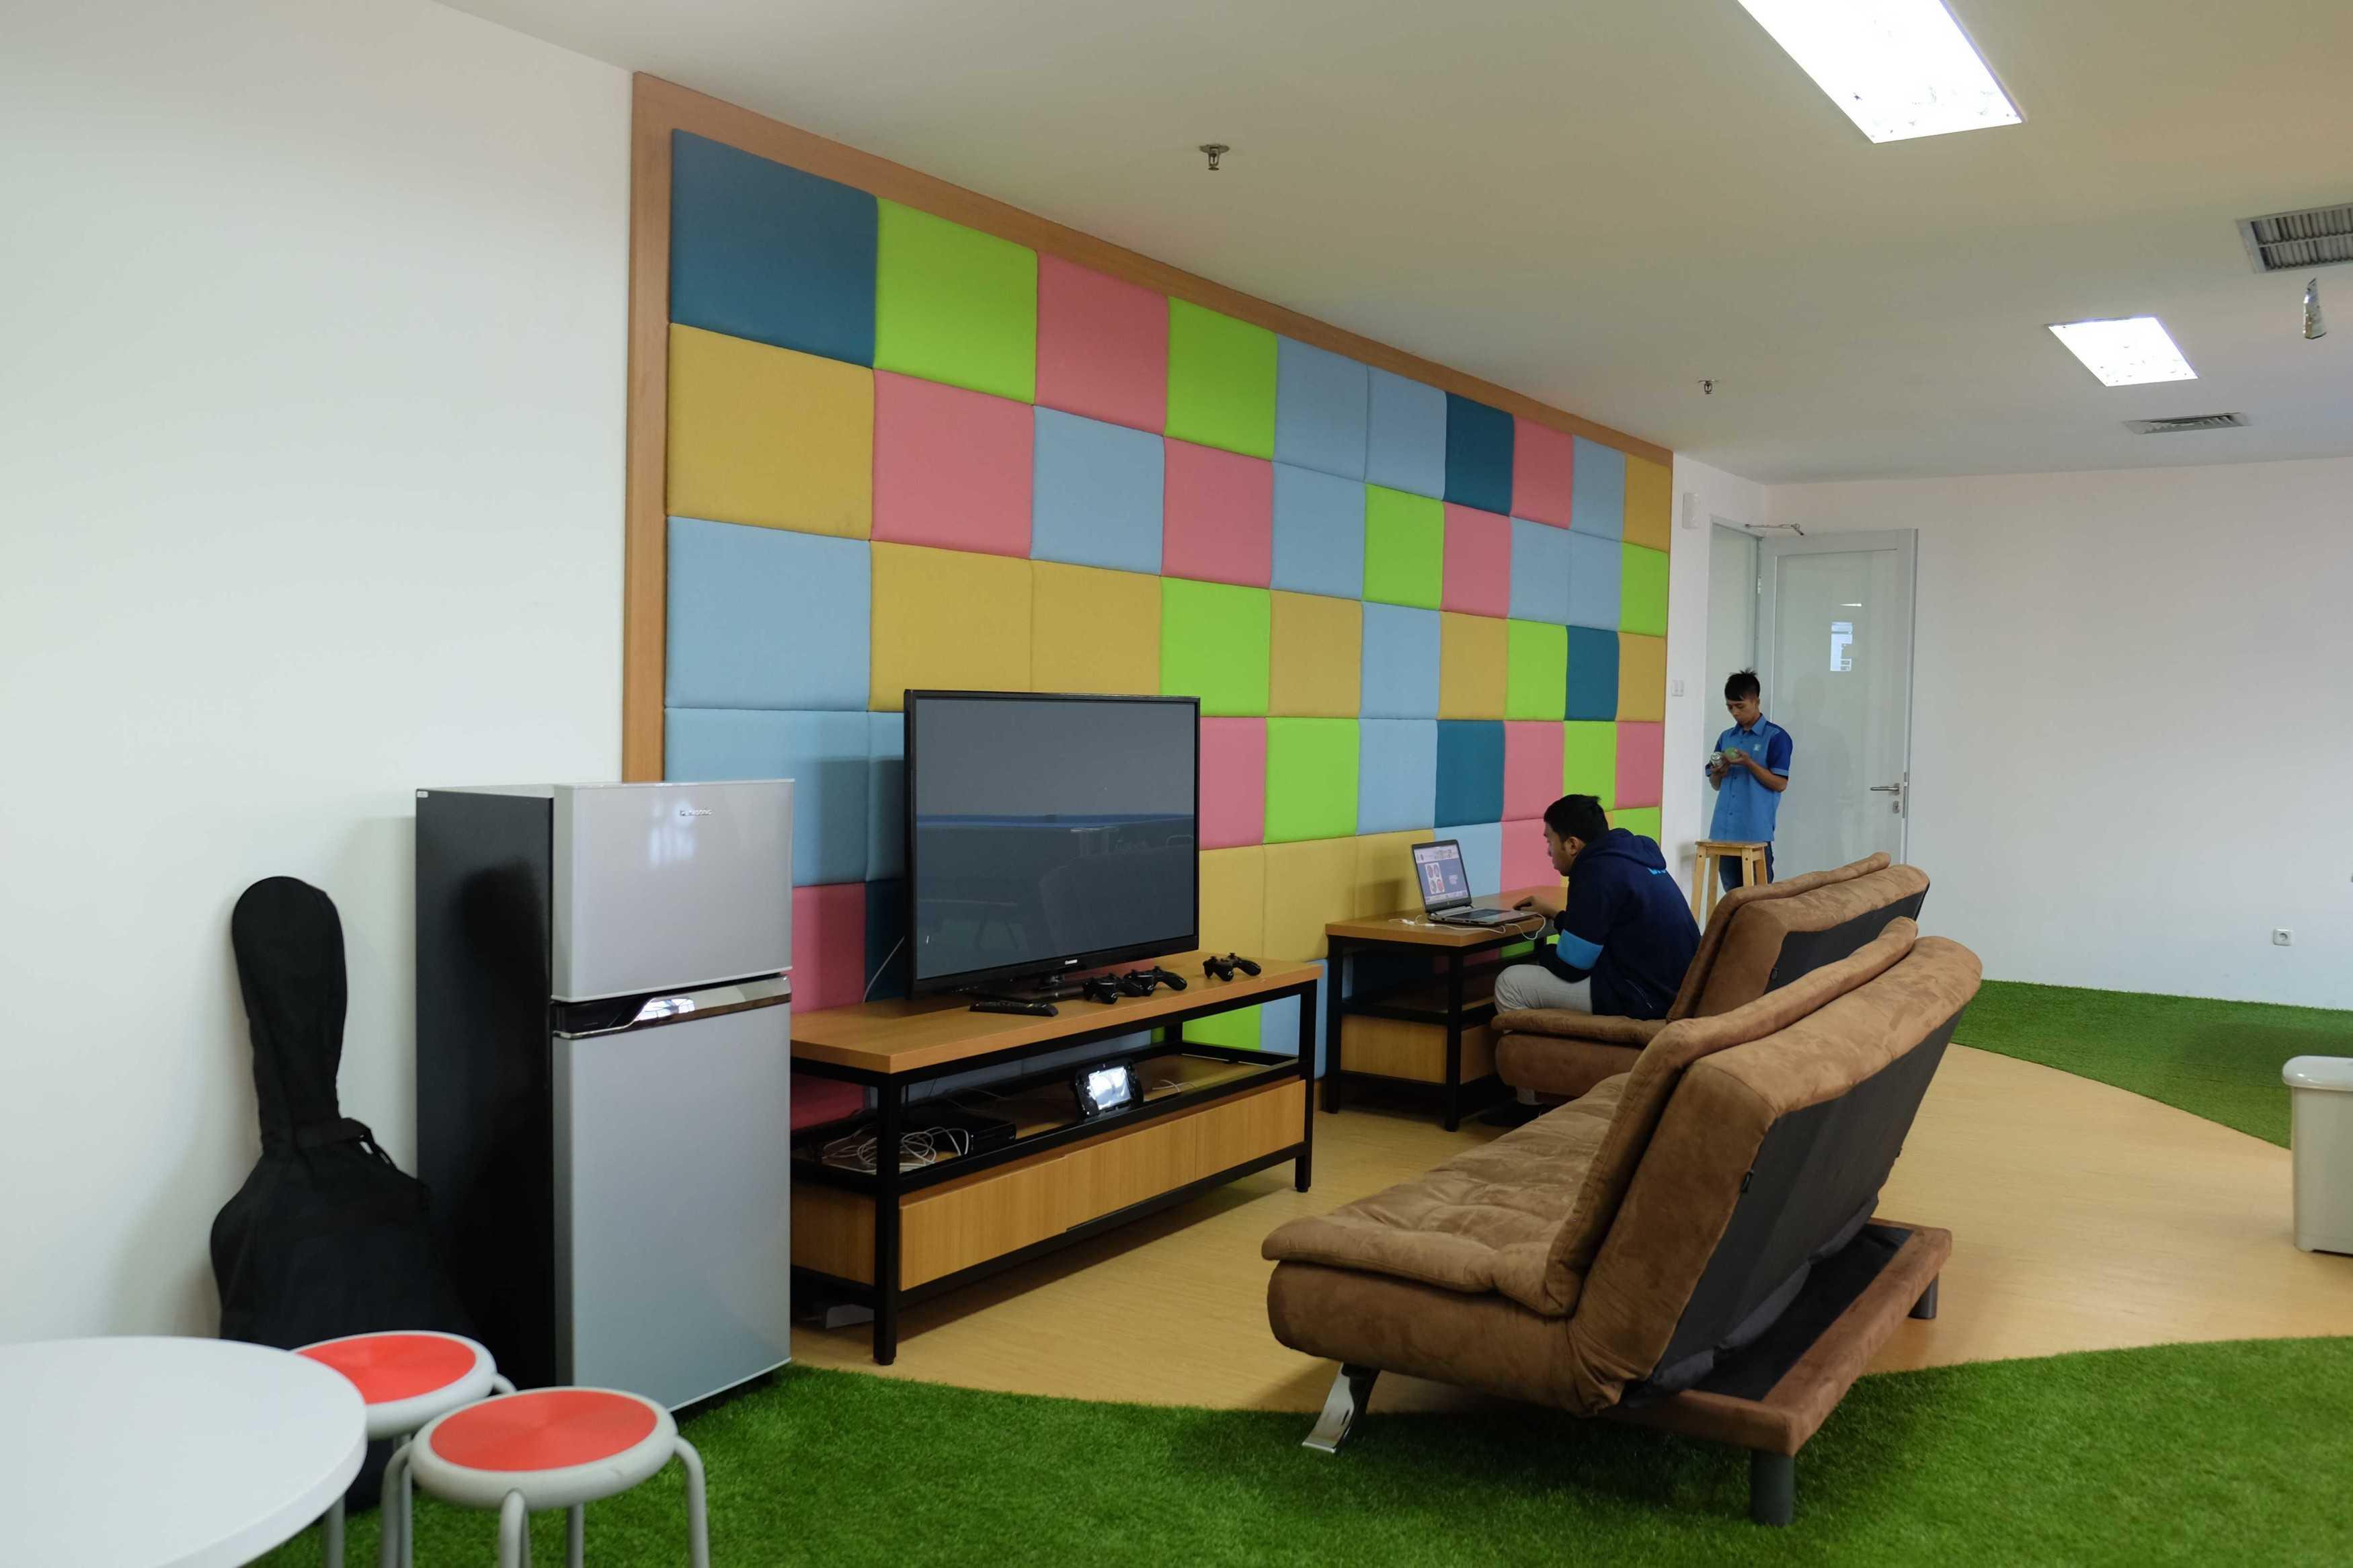 Kotak Design Kudo (Kios Untuk Dagang Online) Jakarta, Daerah Khusus Ibukota Jakarta, Indonesia  Entertainment Room Modern  45936